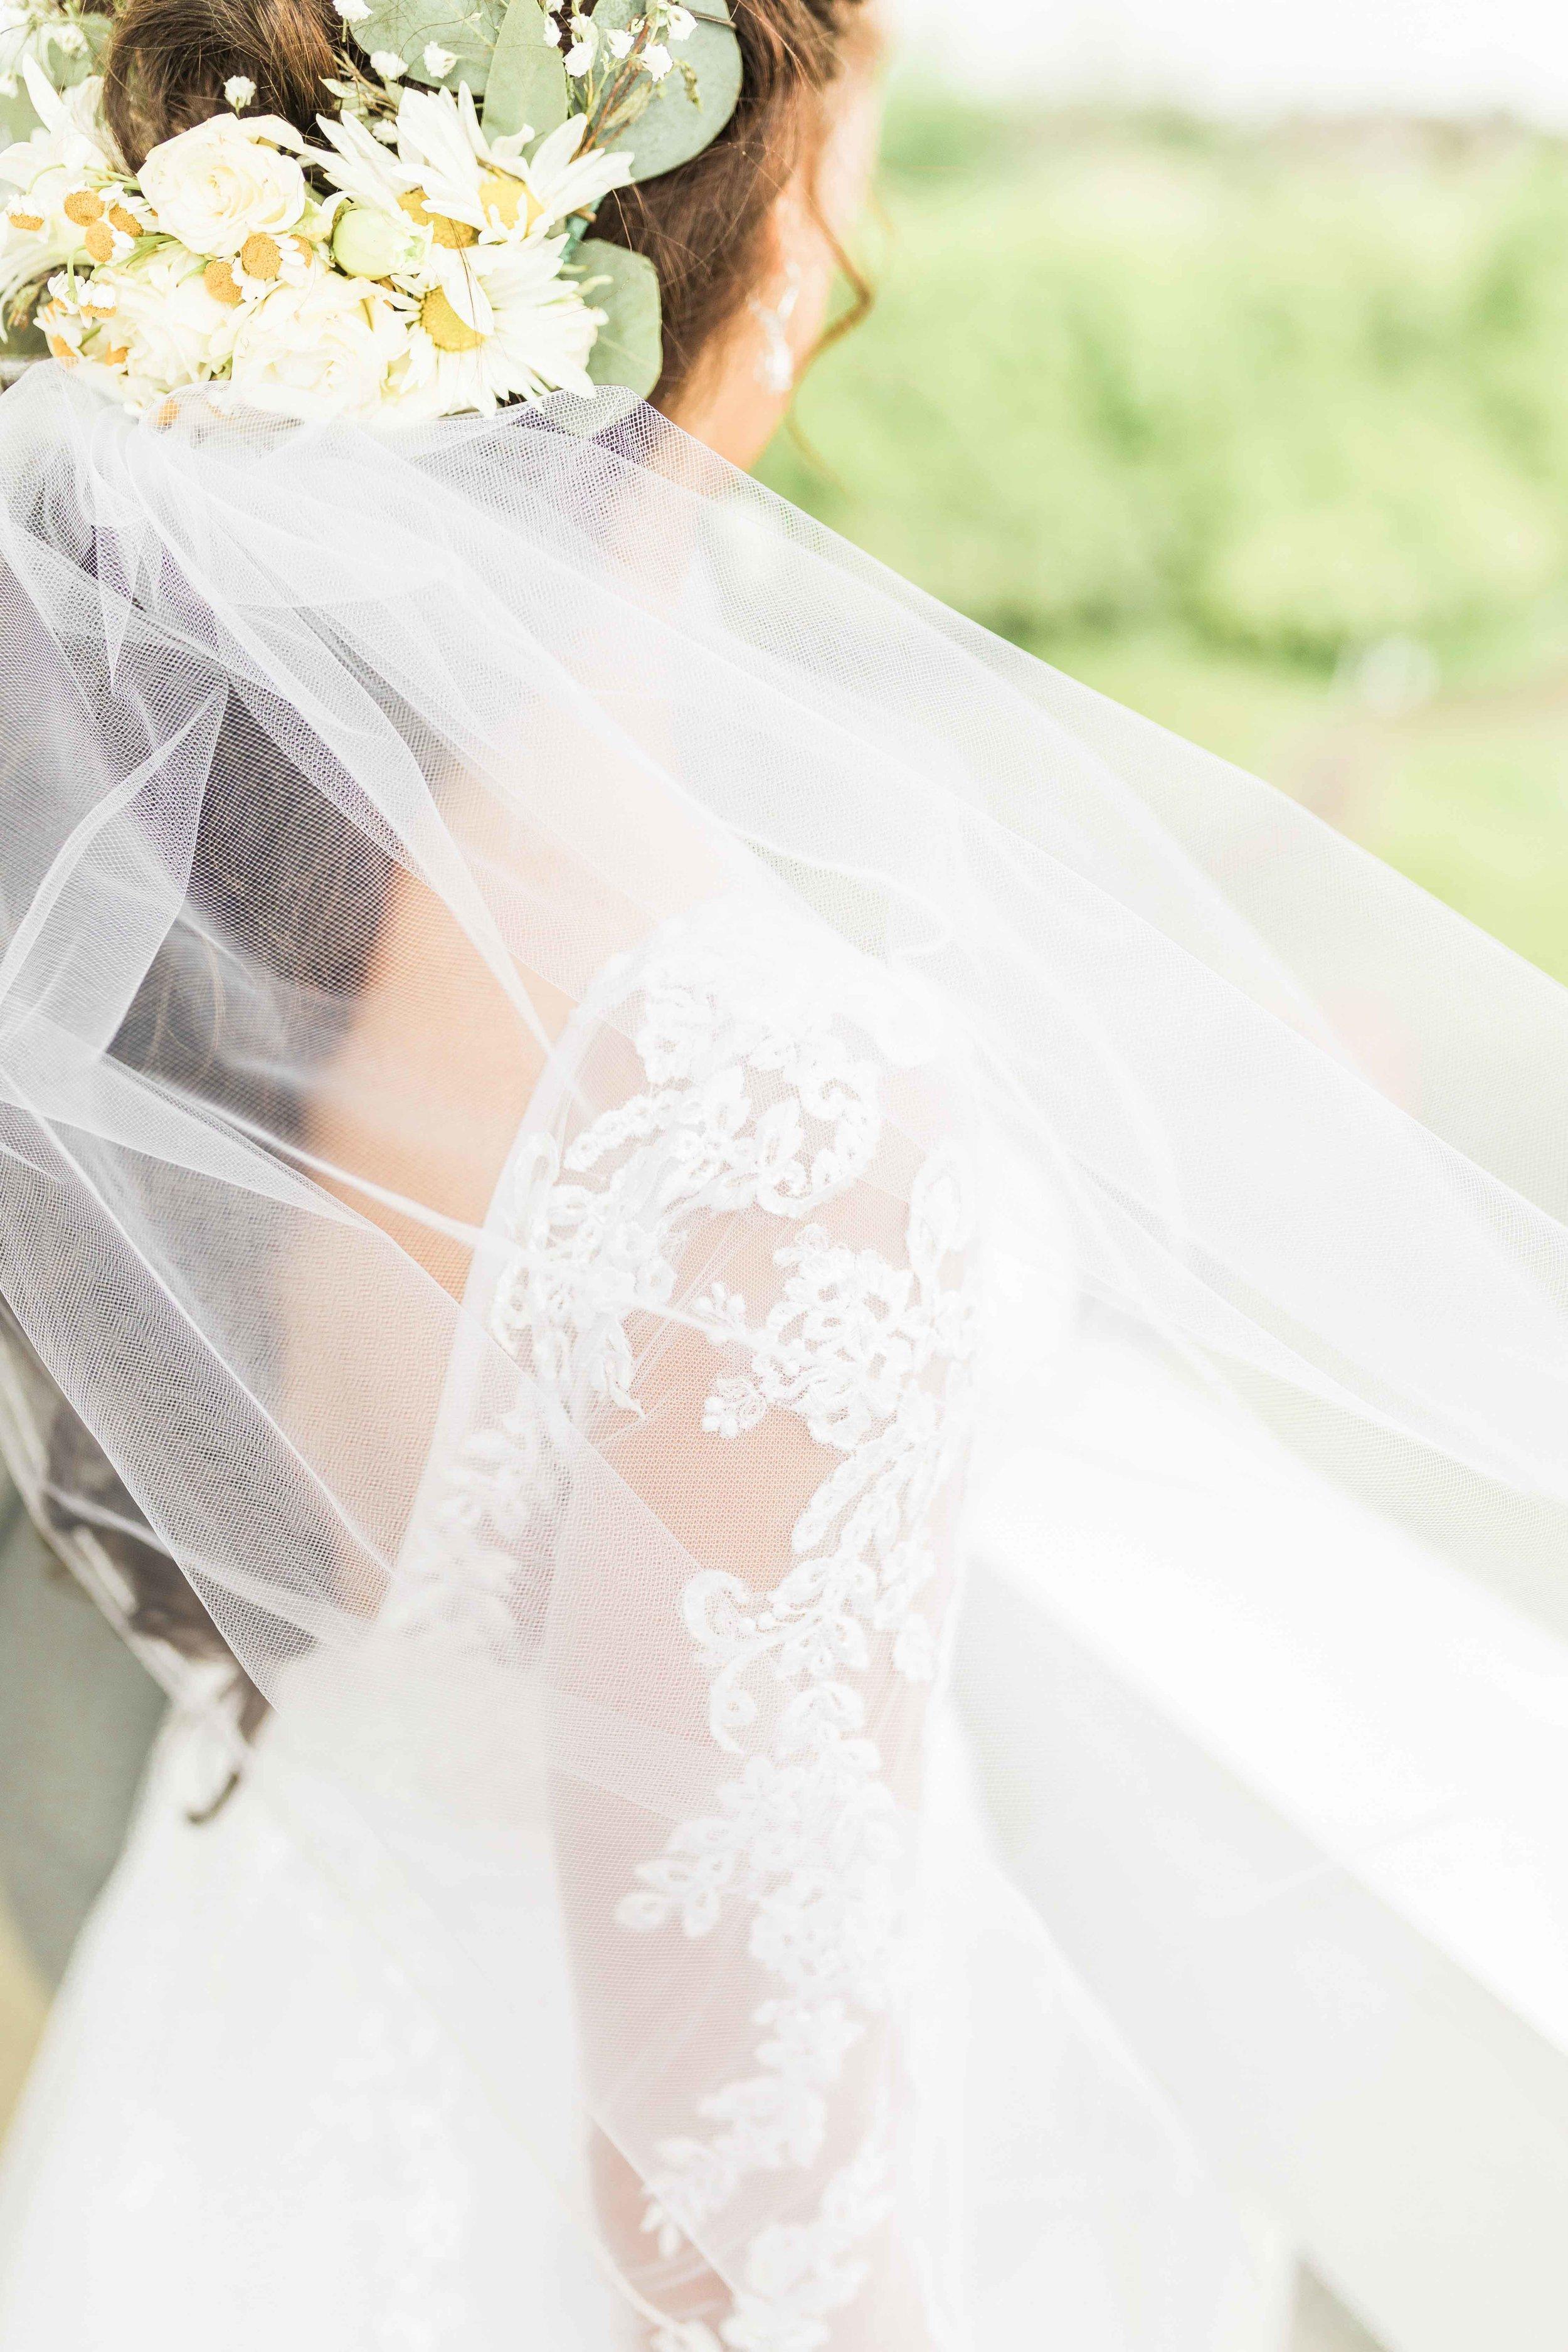 cincinnati wedding photographers lauren day photography-7.jpg